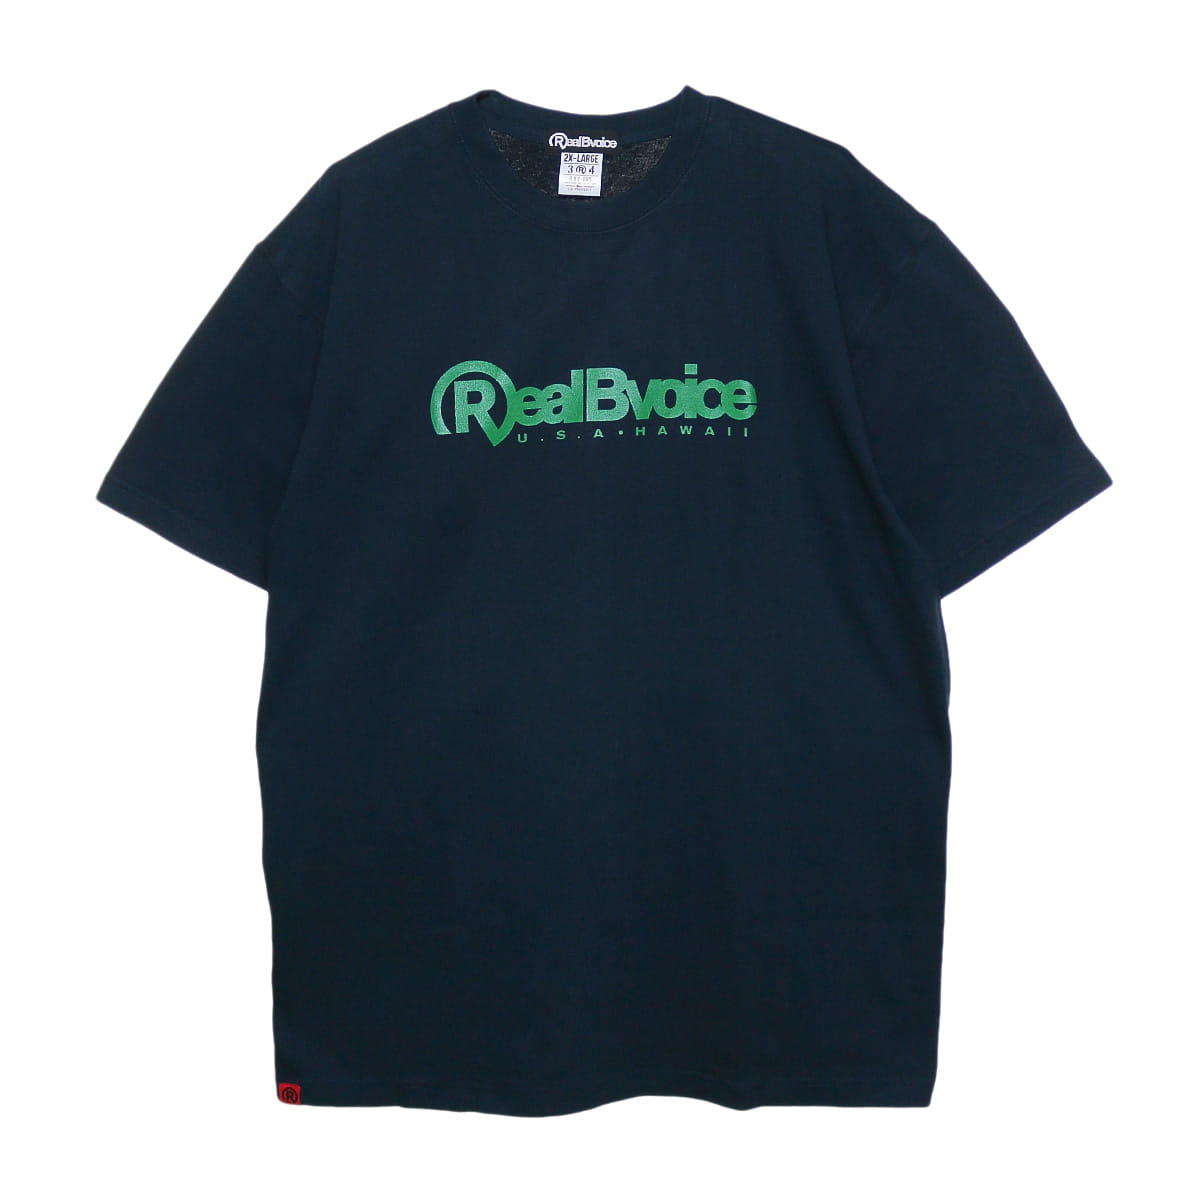 BASIC RBV LOGO T-SHIRT BIG SIZE